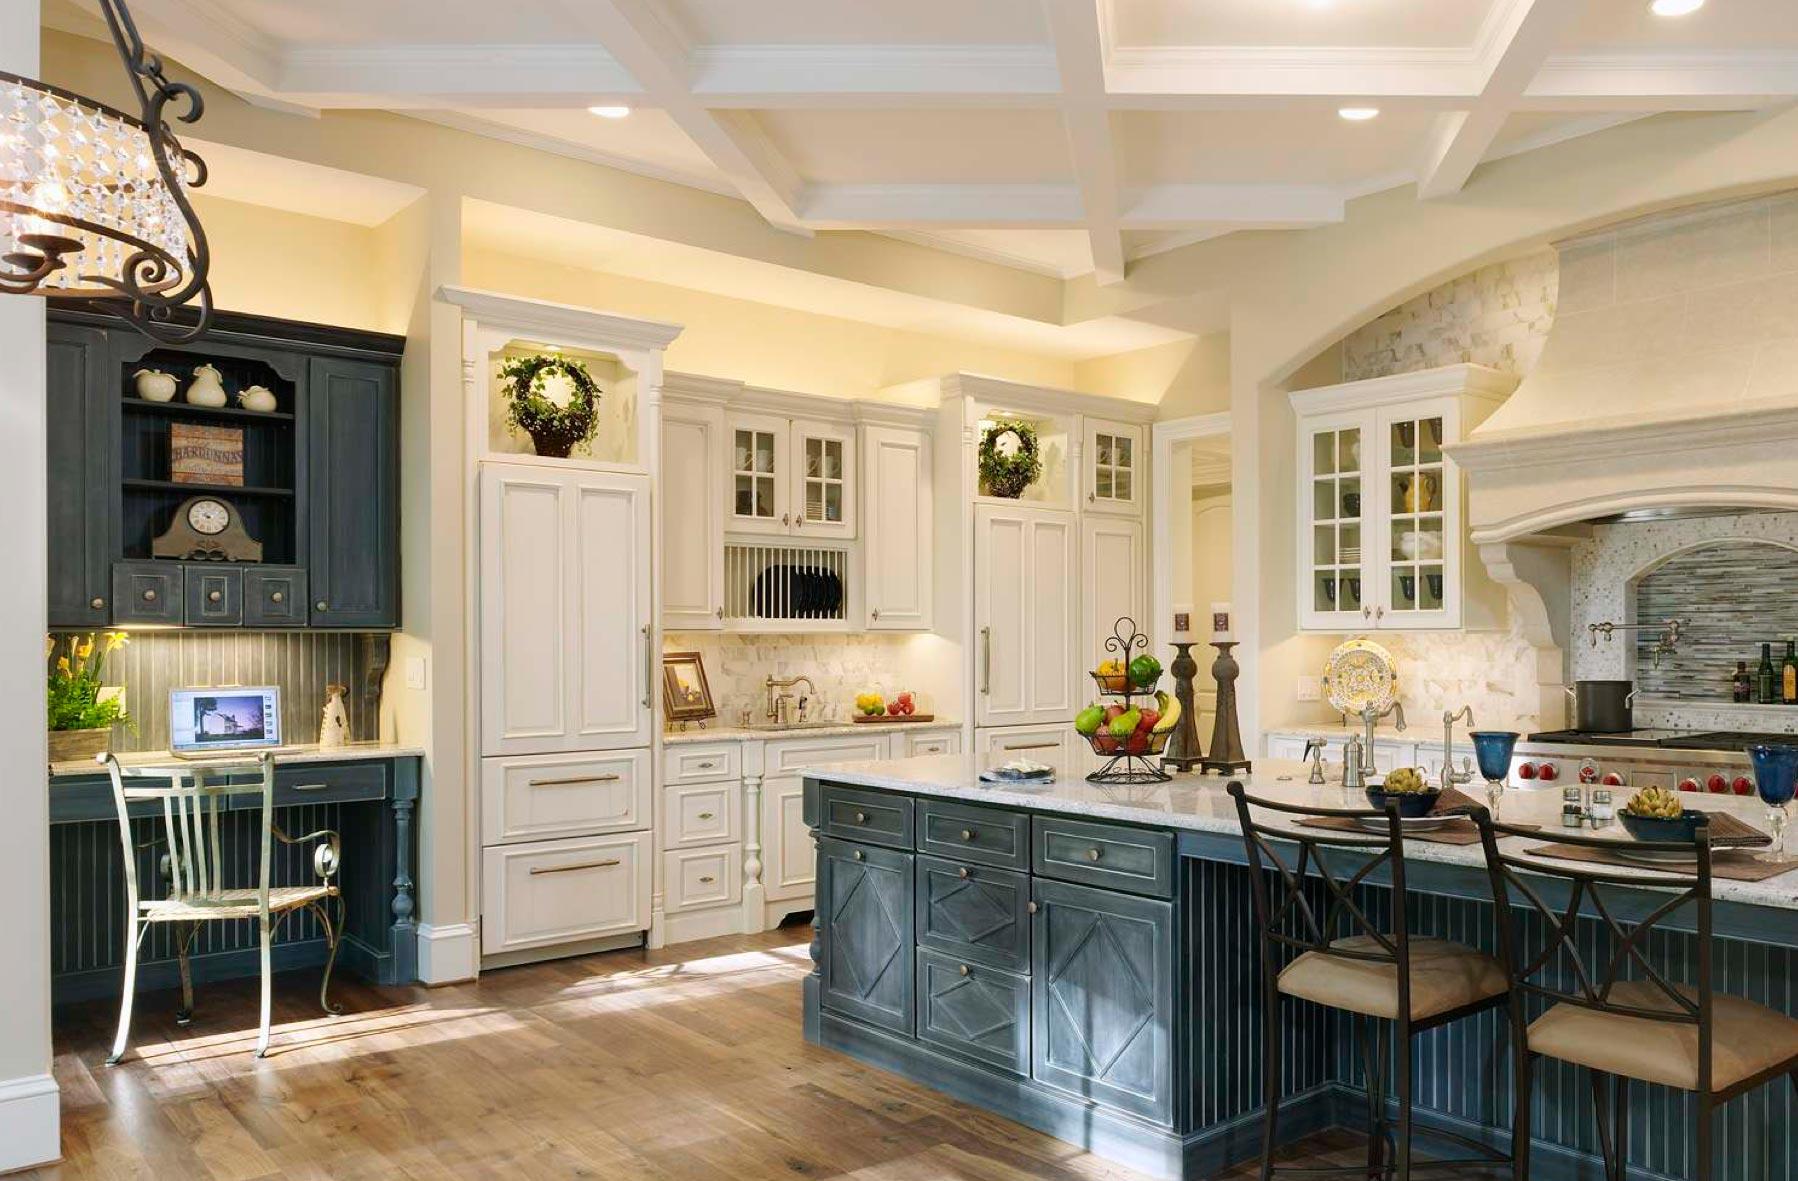 Kitchen Painting Michigan - Troy, Rochester Hills, Auburn Hills